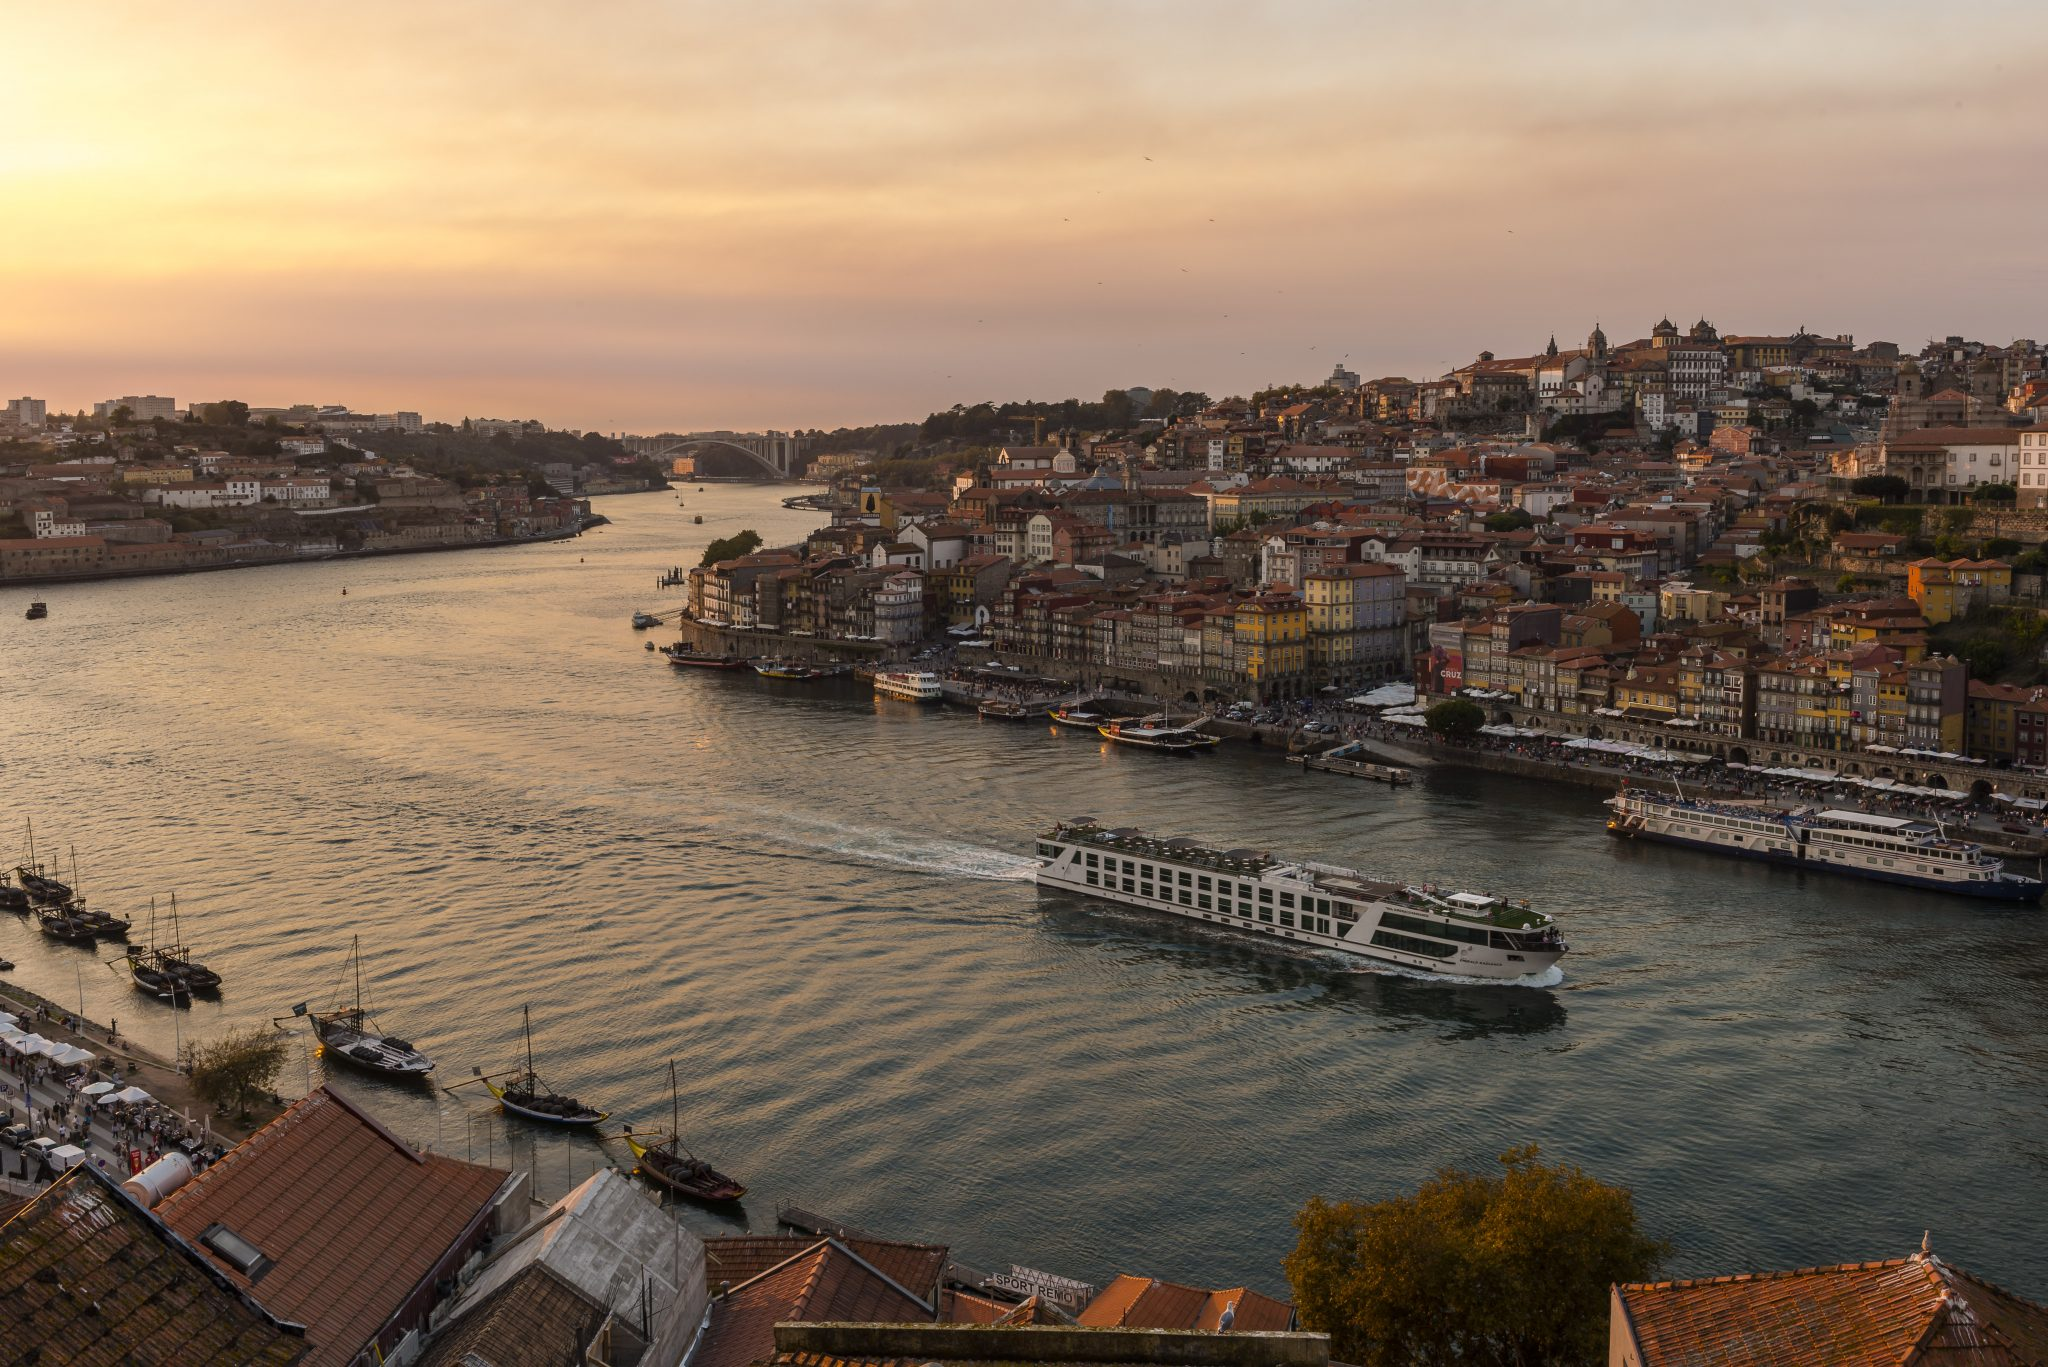 Douro Flussfahrt/Porto, SF 08/2018